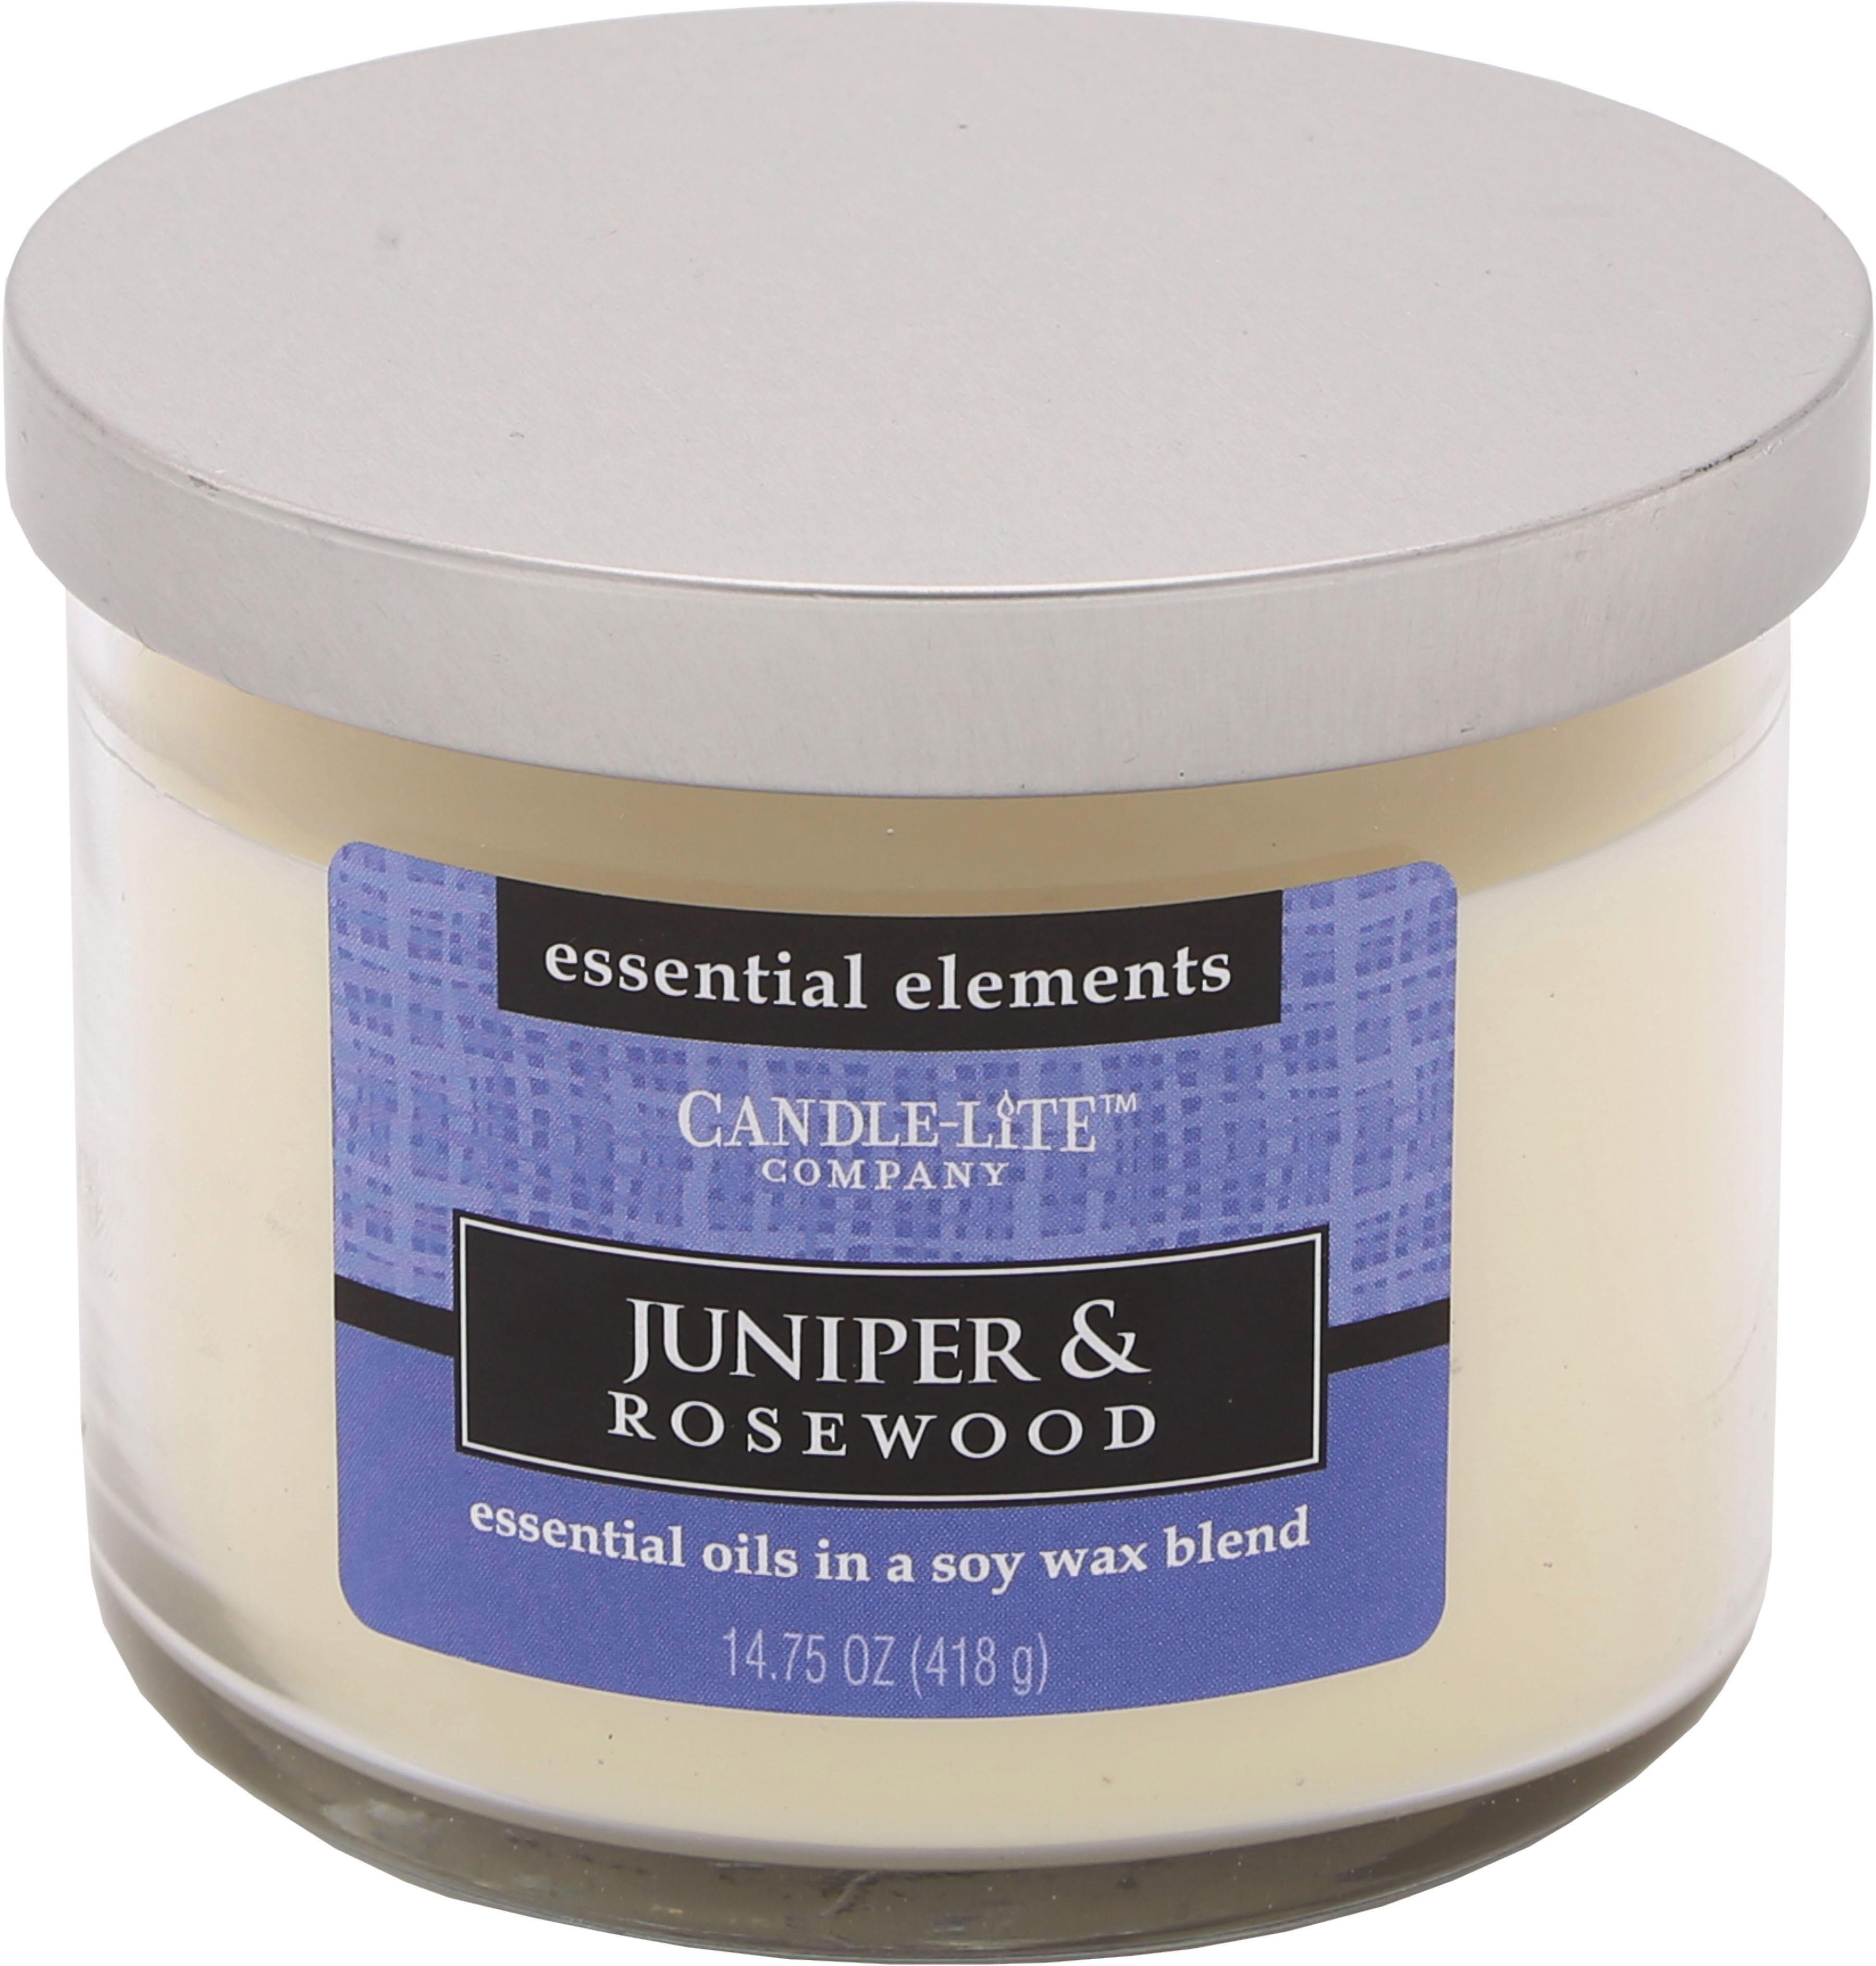 Candle-lite™ Duftkerze, 418 g, »Juniper & Rosewood«